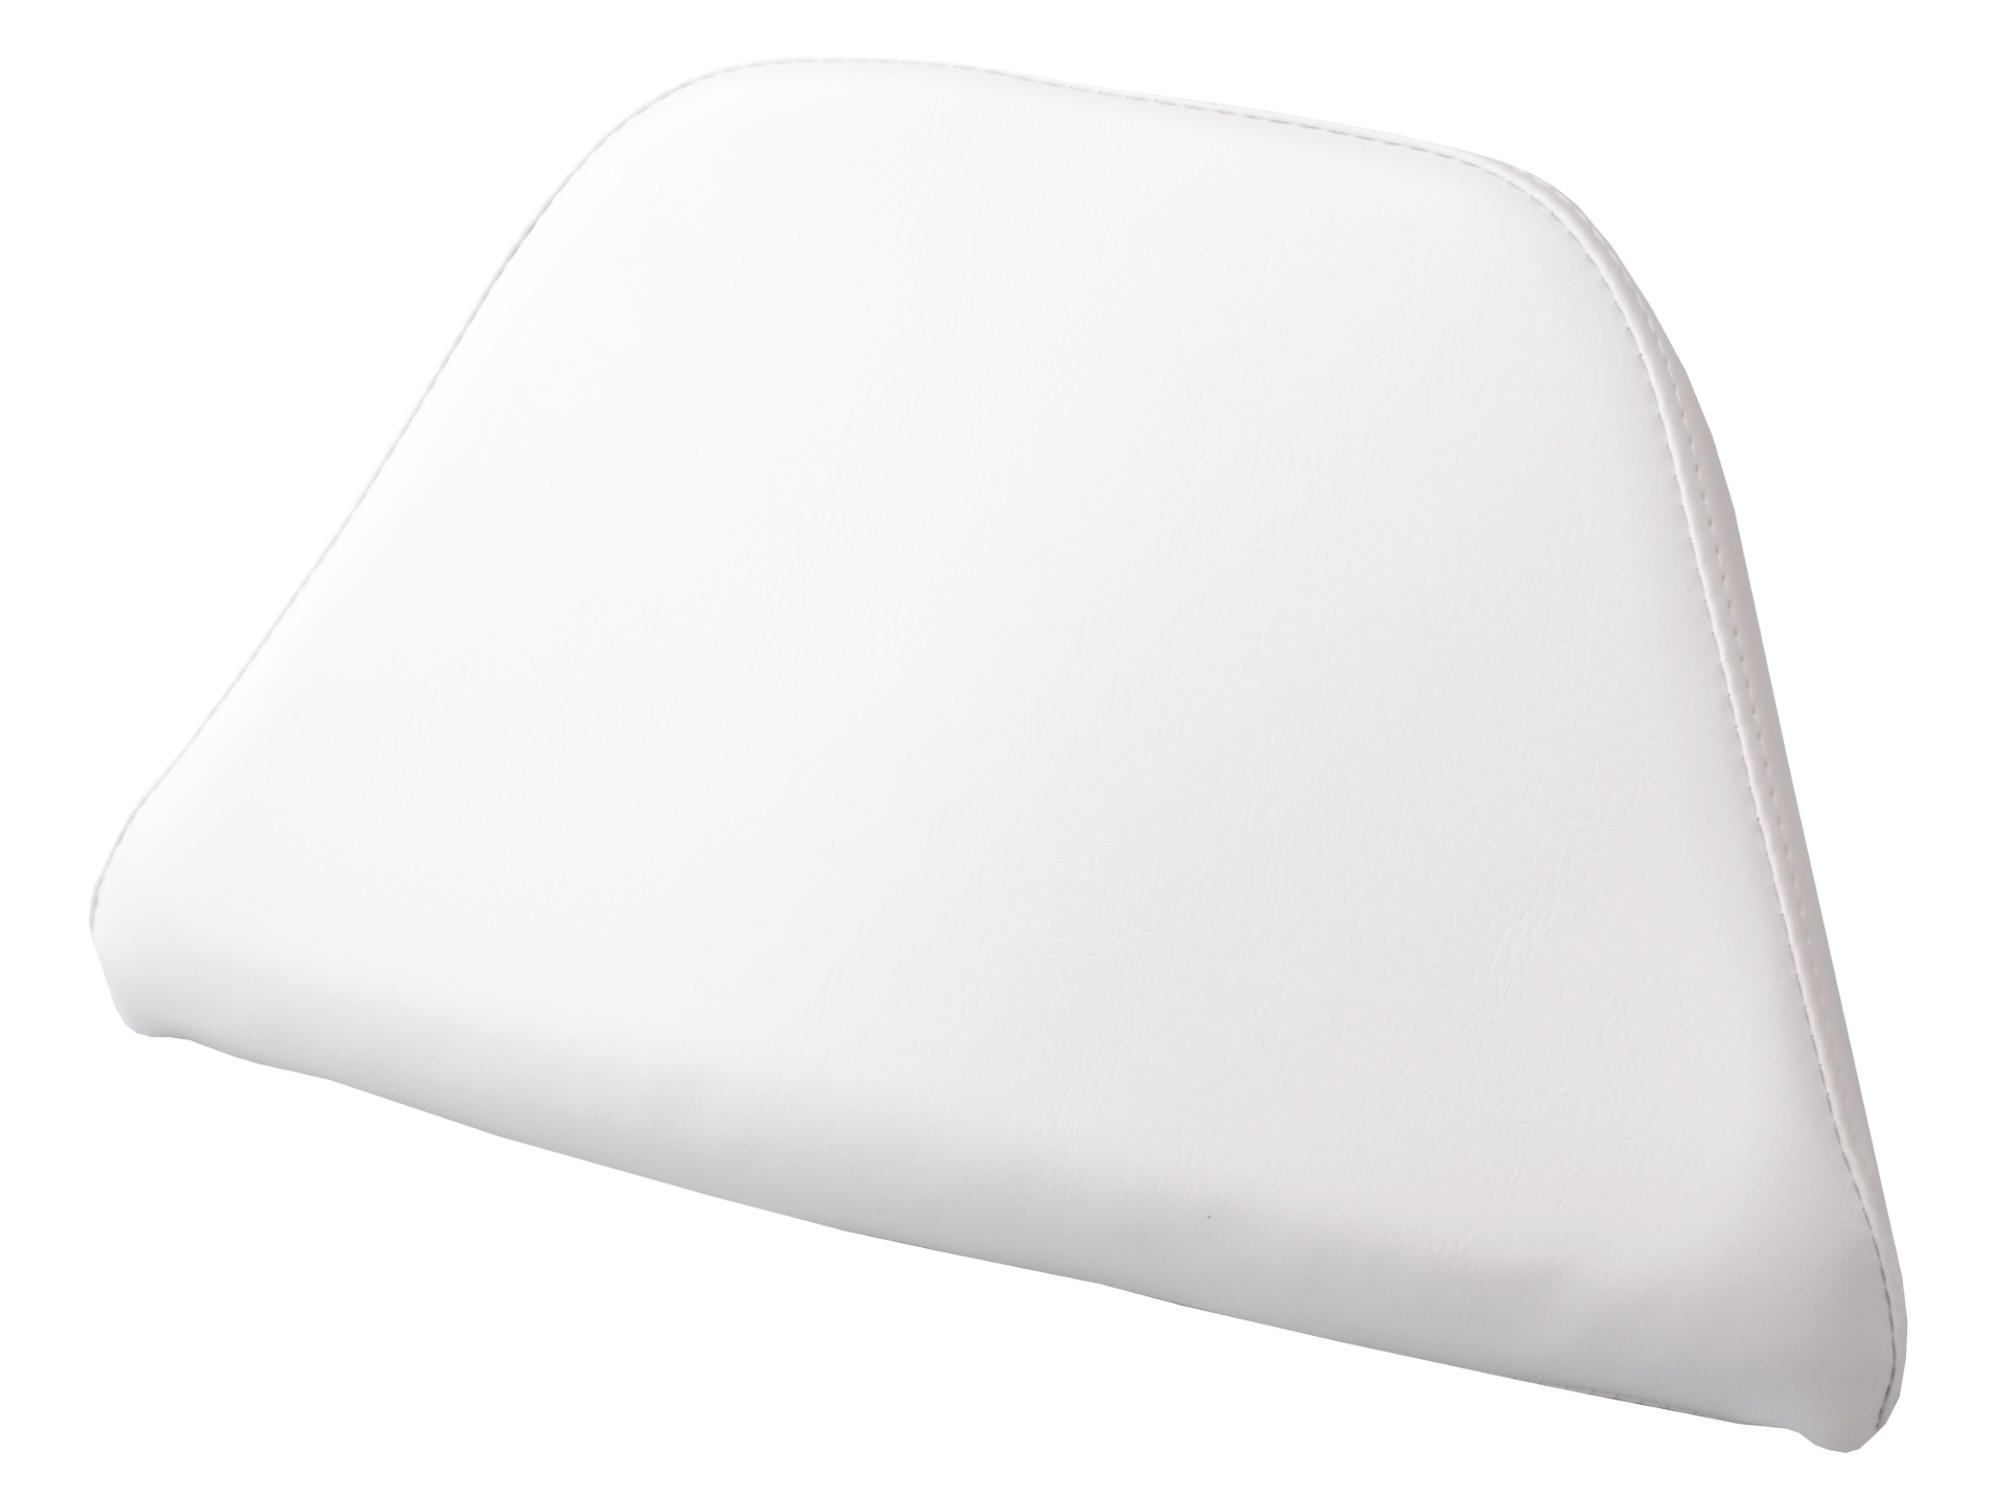 Náhradní polštář pro kosmetické lehátko Weelko MENT + DÁREK ZDARMA